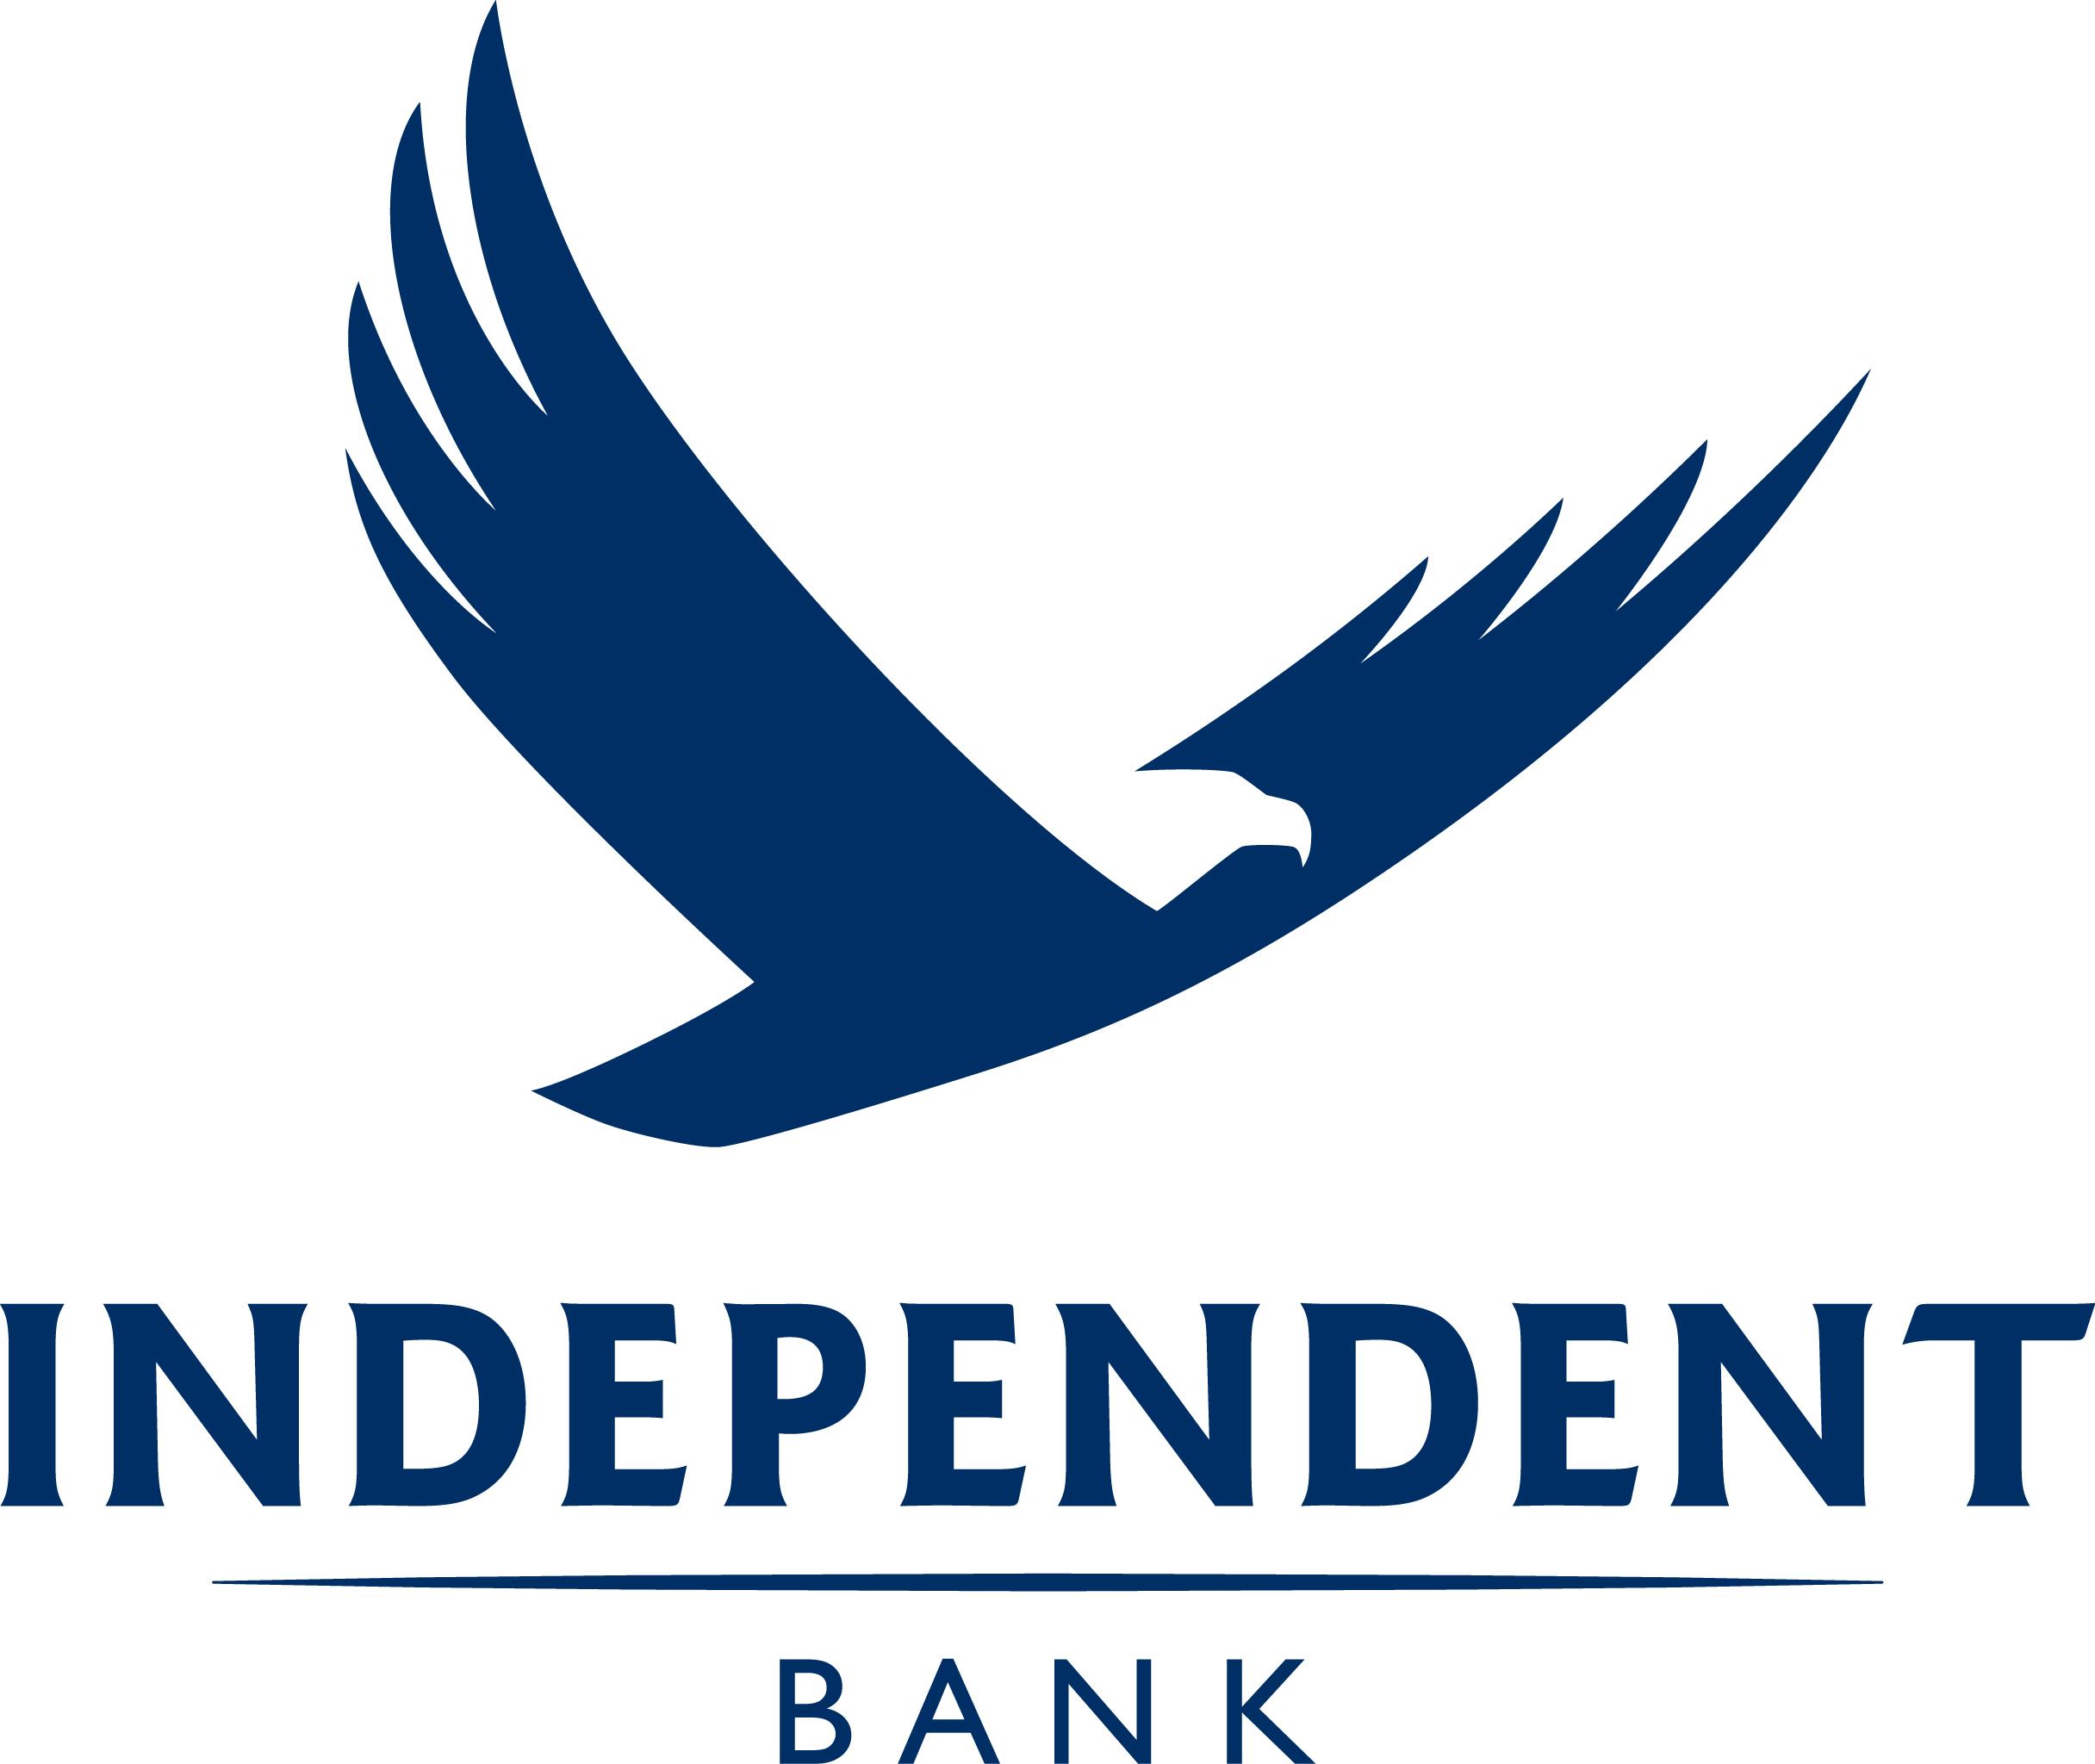 Independent_Bank_2016.jpg